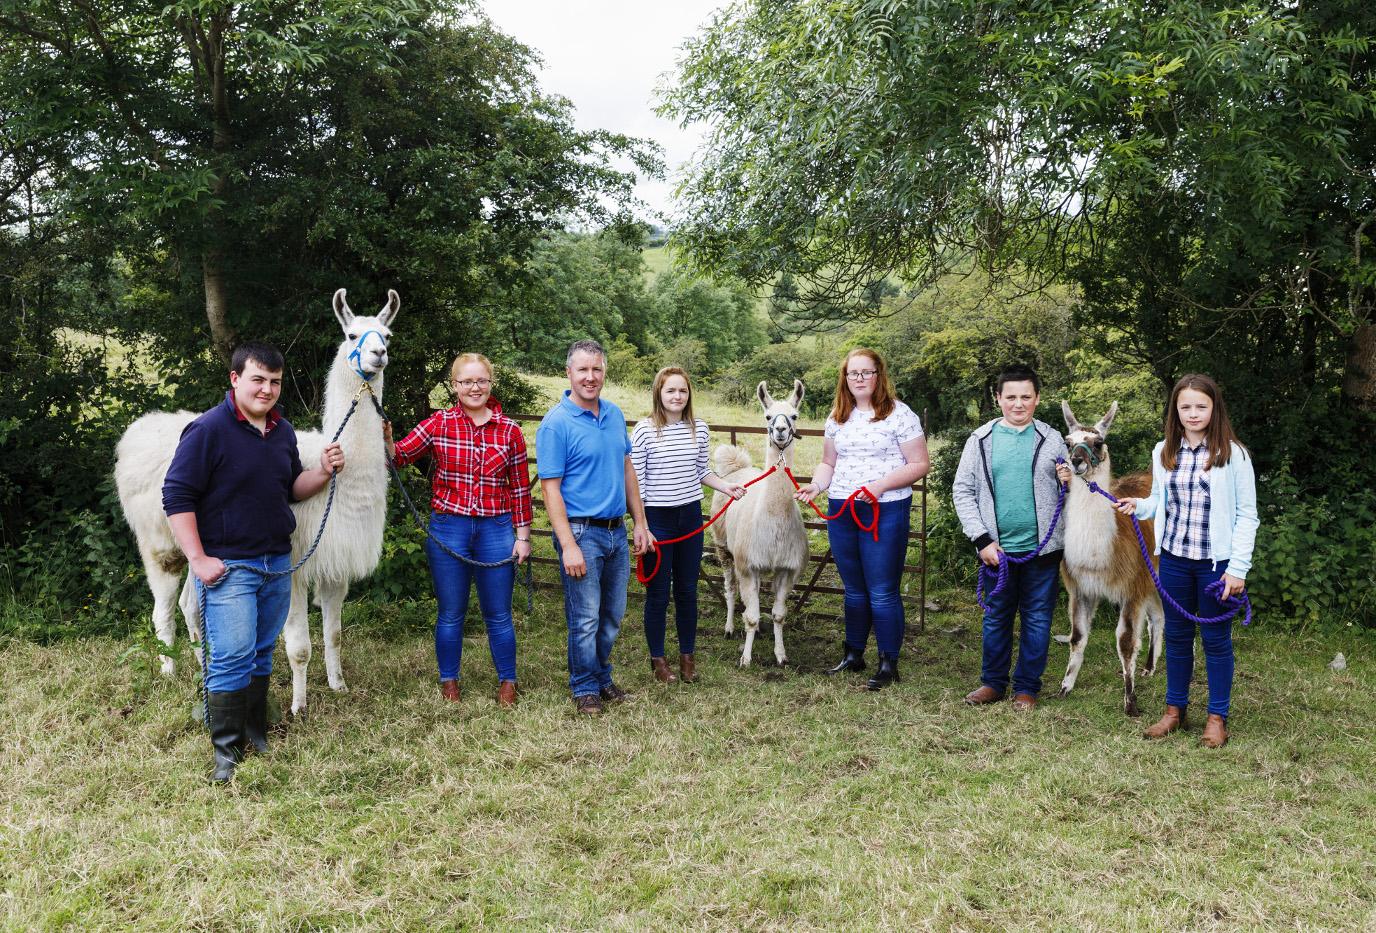 BBC One, Oneness, Llamas, Photographer: Martin Parr